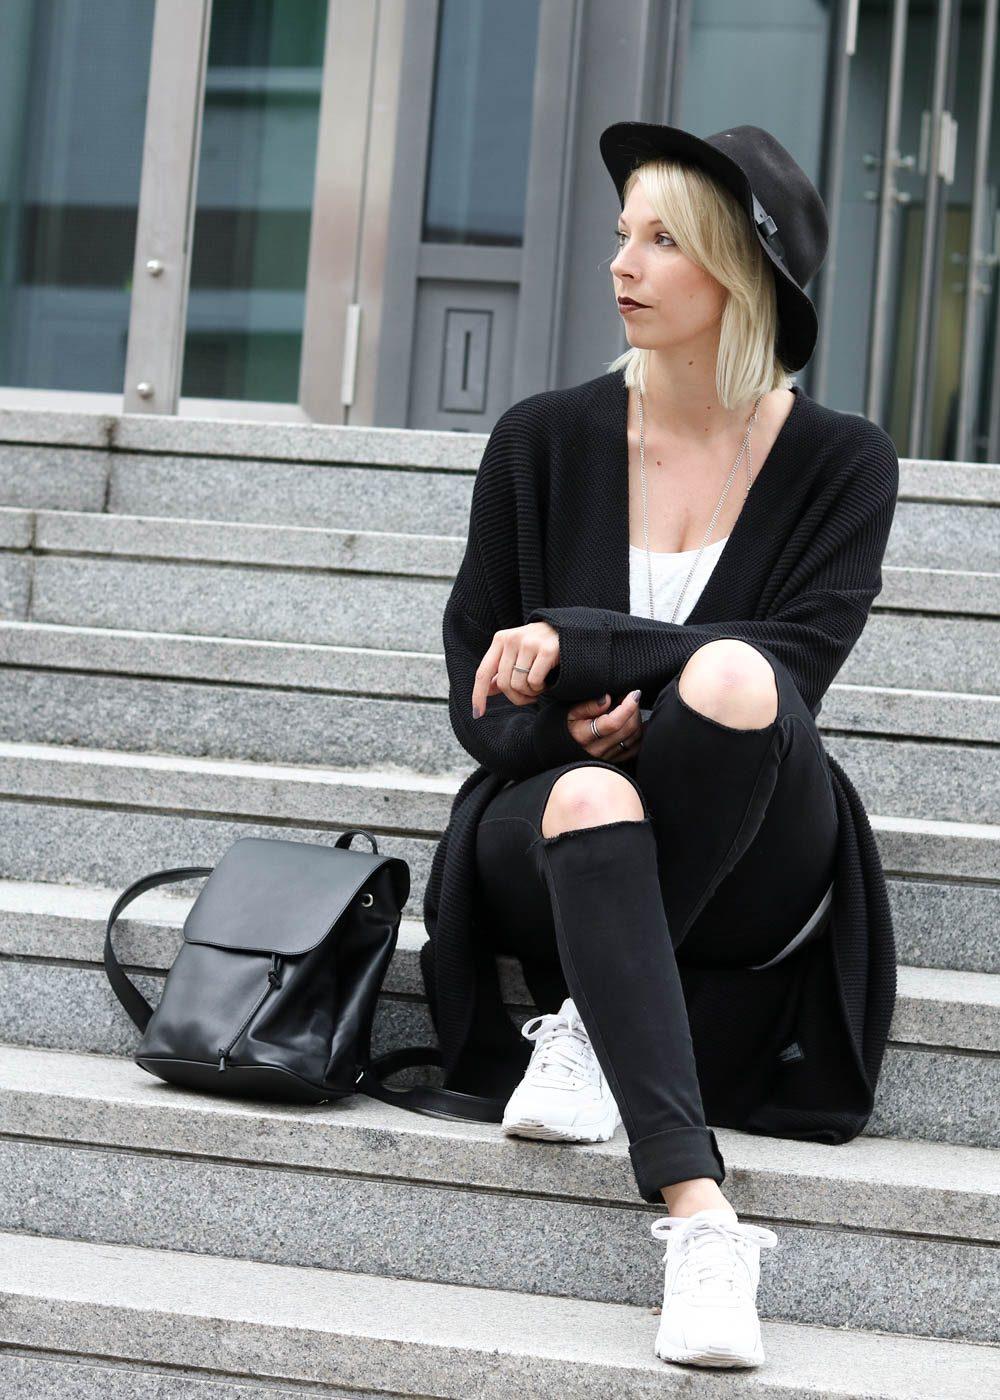 fashionblogger-mannheim-outfit-longcardigan-nike-air-max-skinnyjeans-rucksack-2-1-von-2